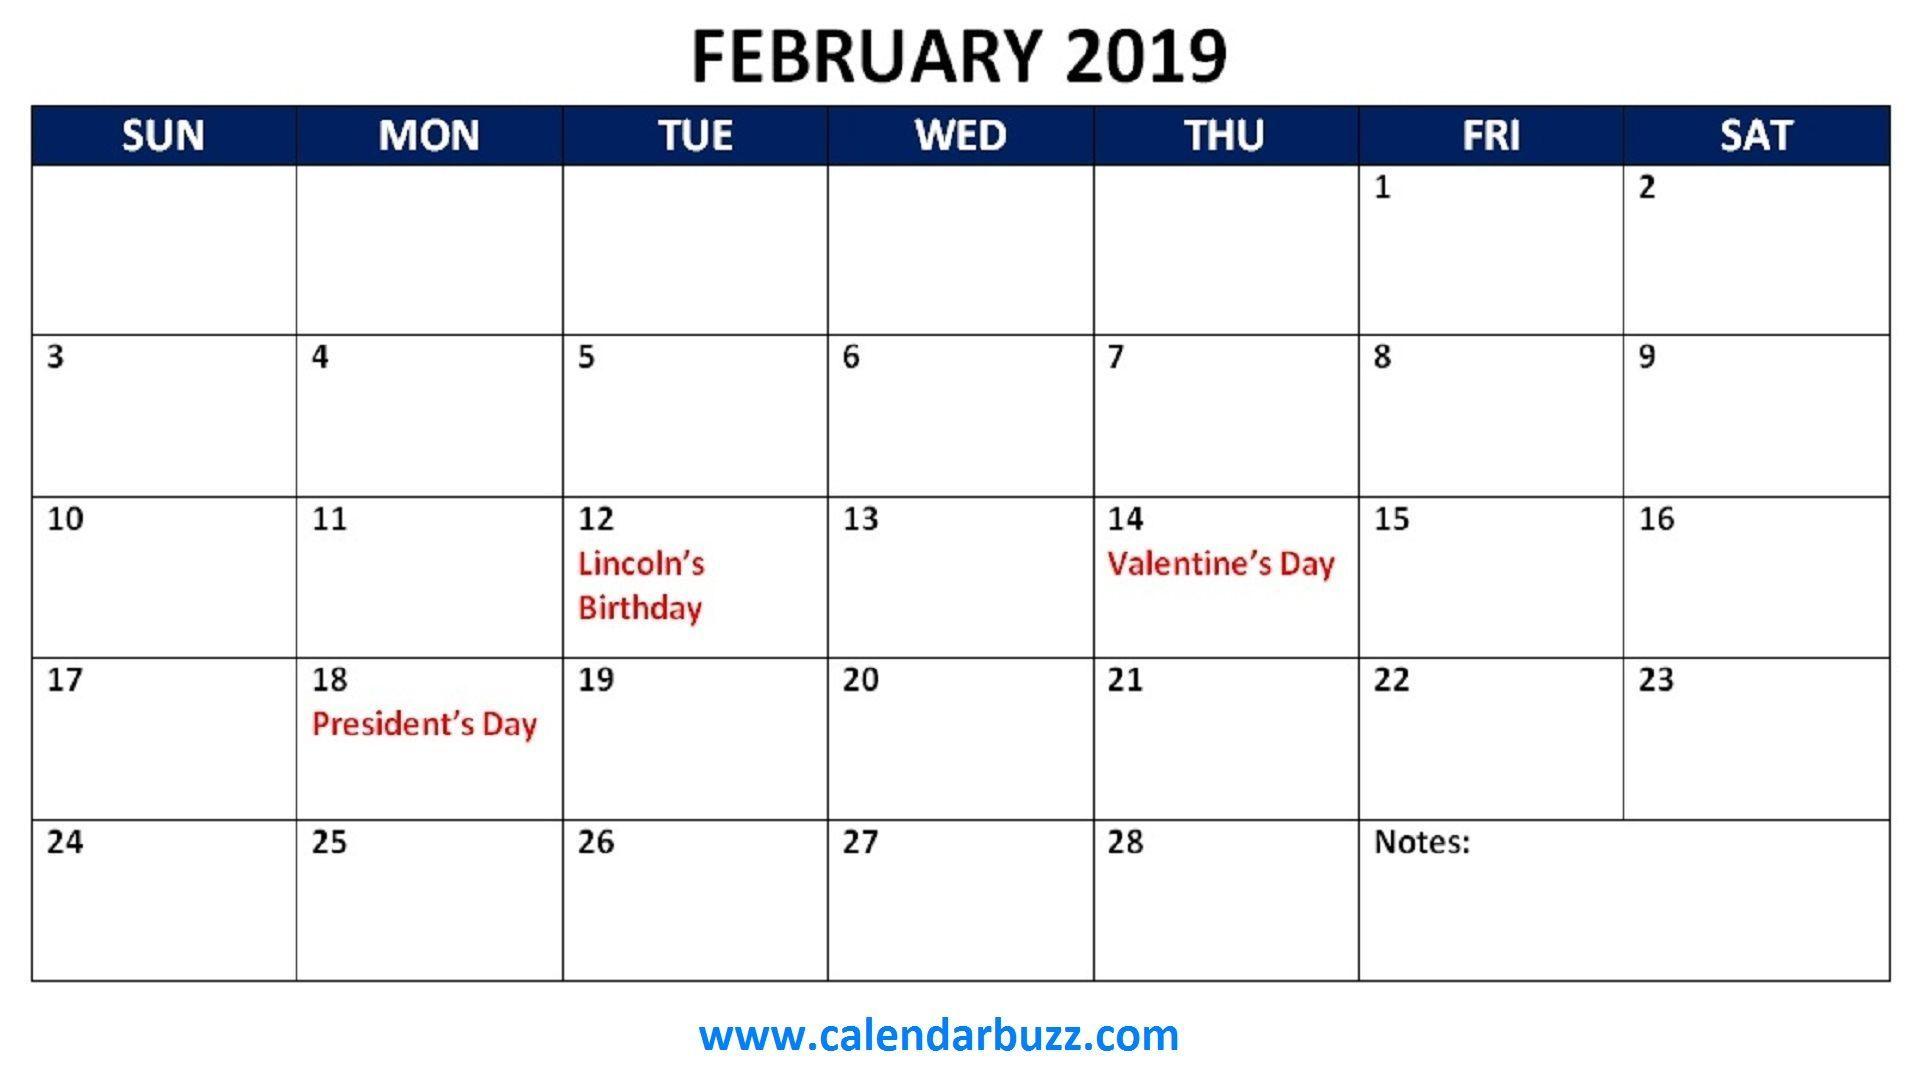 February 2019 Calendar With Holidays Usa Uk Canada India